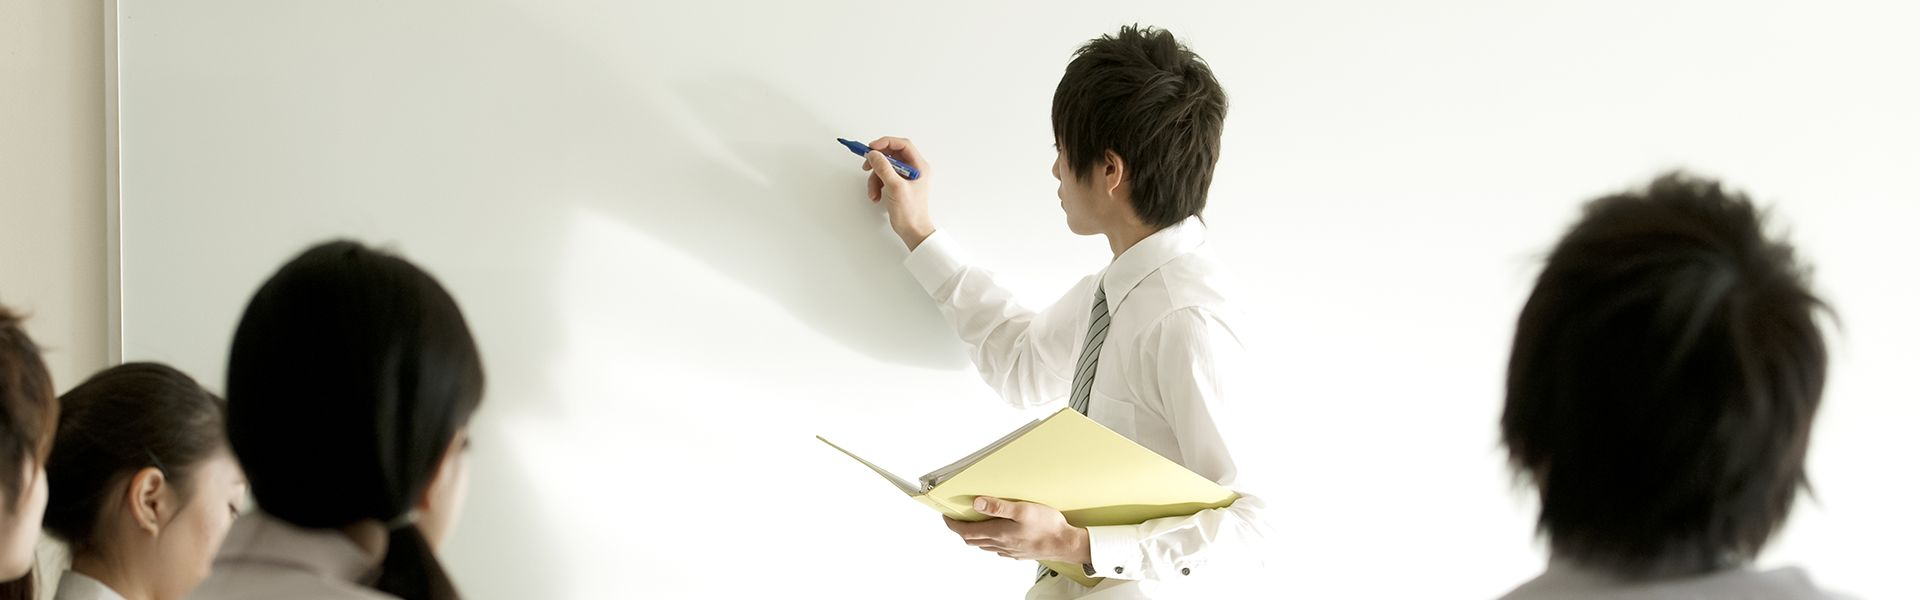 DODA 建材-商社の転職・求人情報-